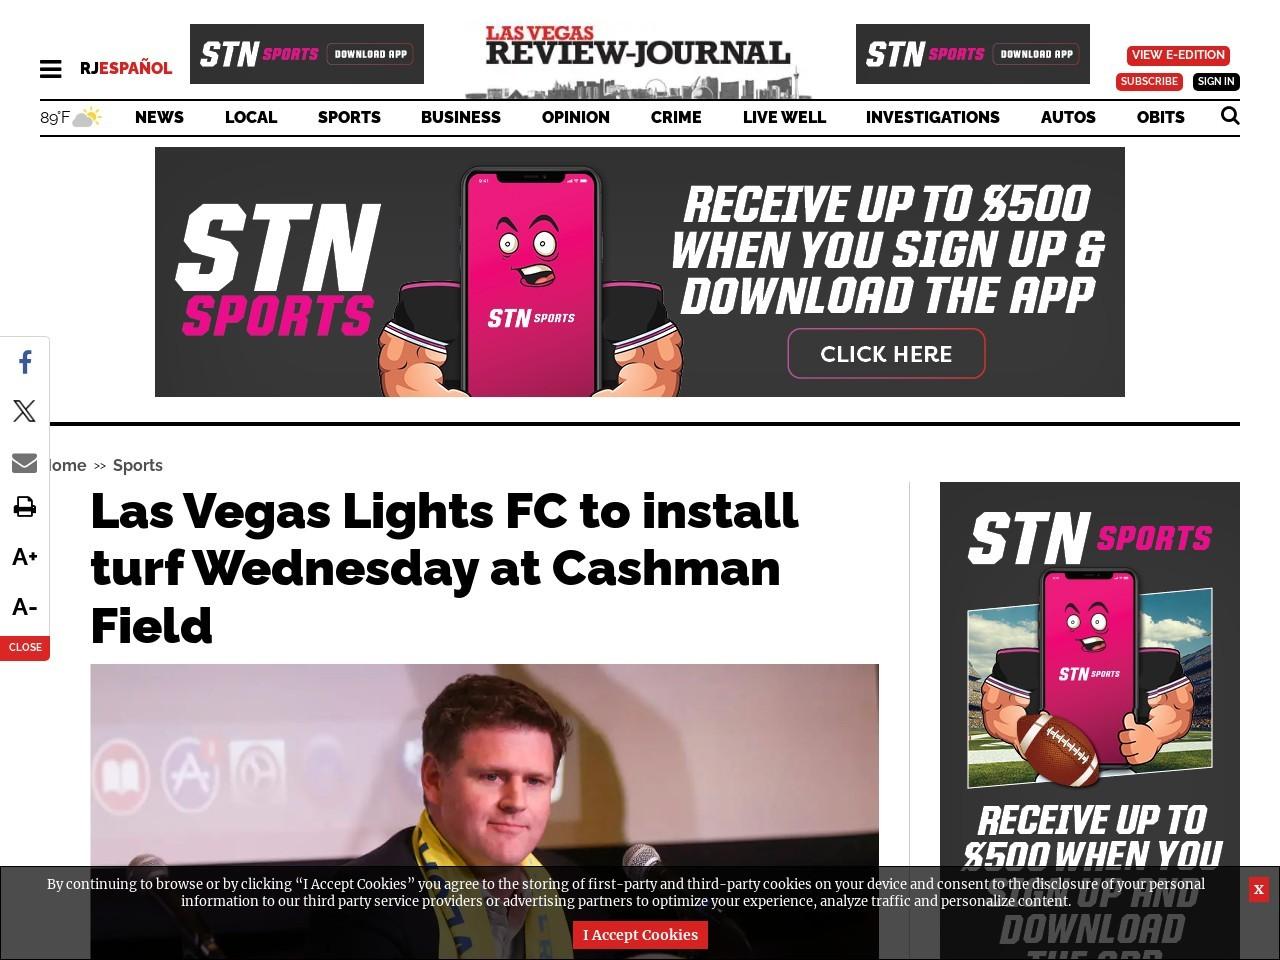 Las Vegas Lights FC to install turf Wednesday at Cashman Field